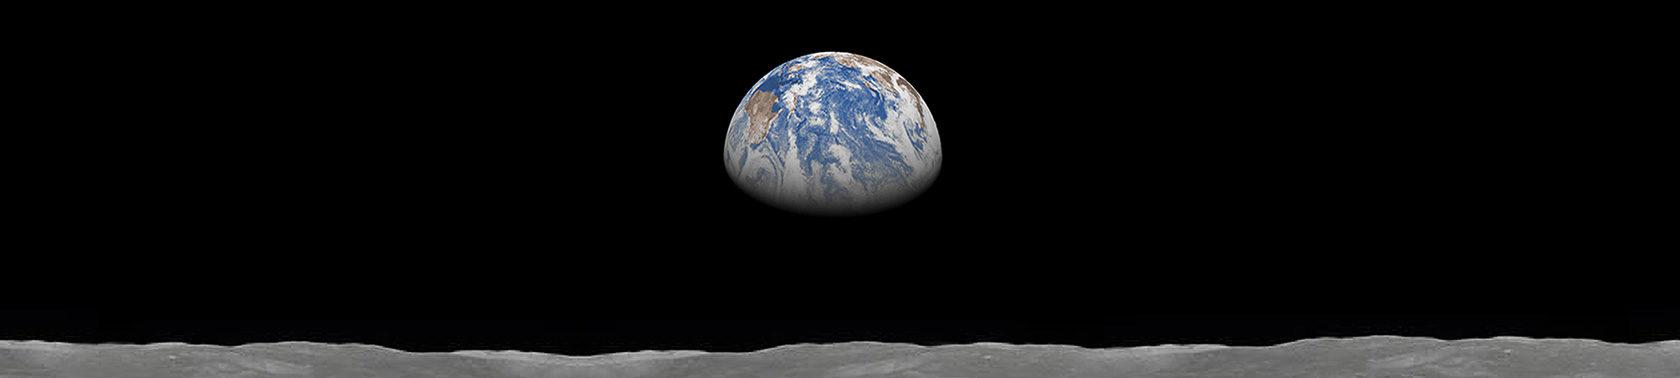 Blog banner moon images